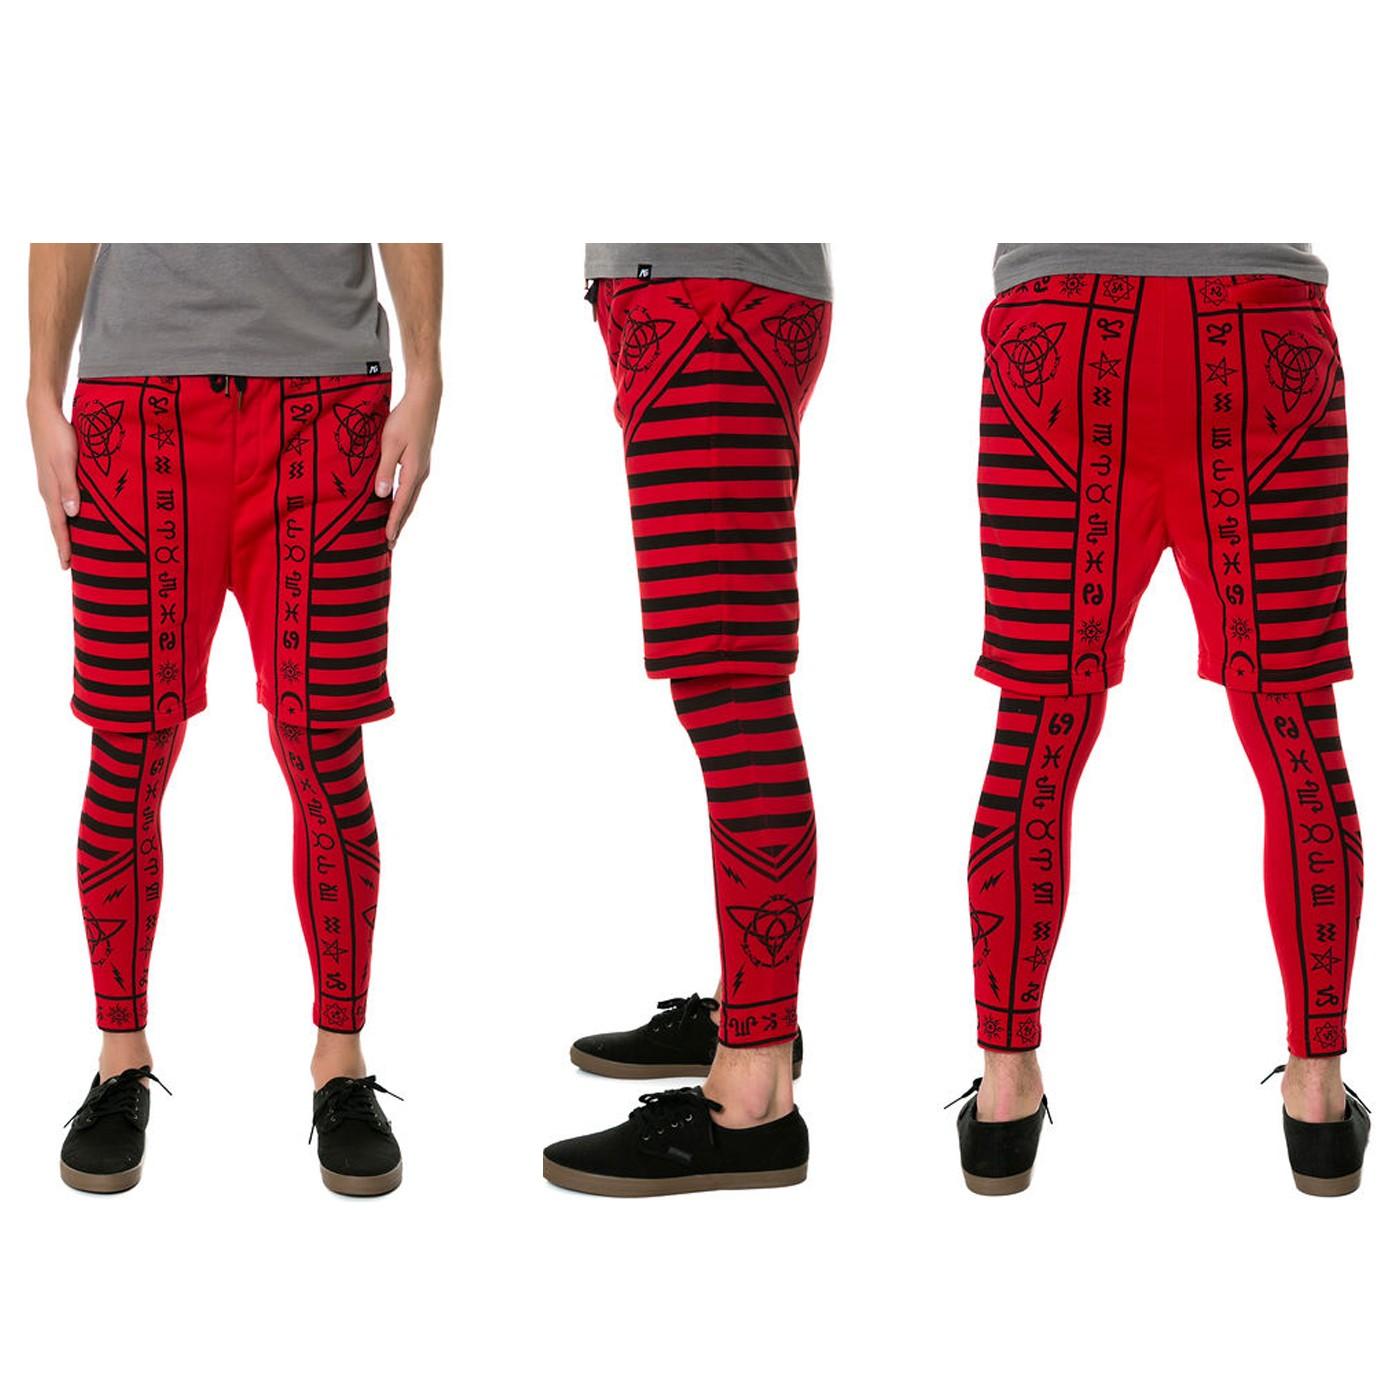 New Mens Square Zero 100/% Cotton Joggers Pants Stars Front//Back Pockets M-2XL